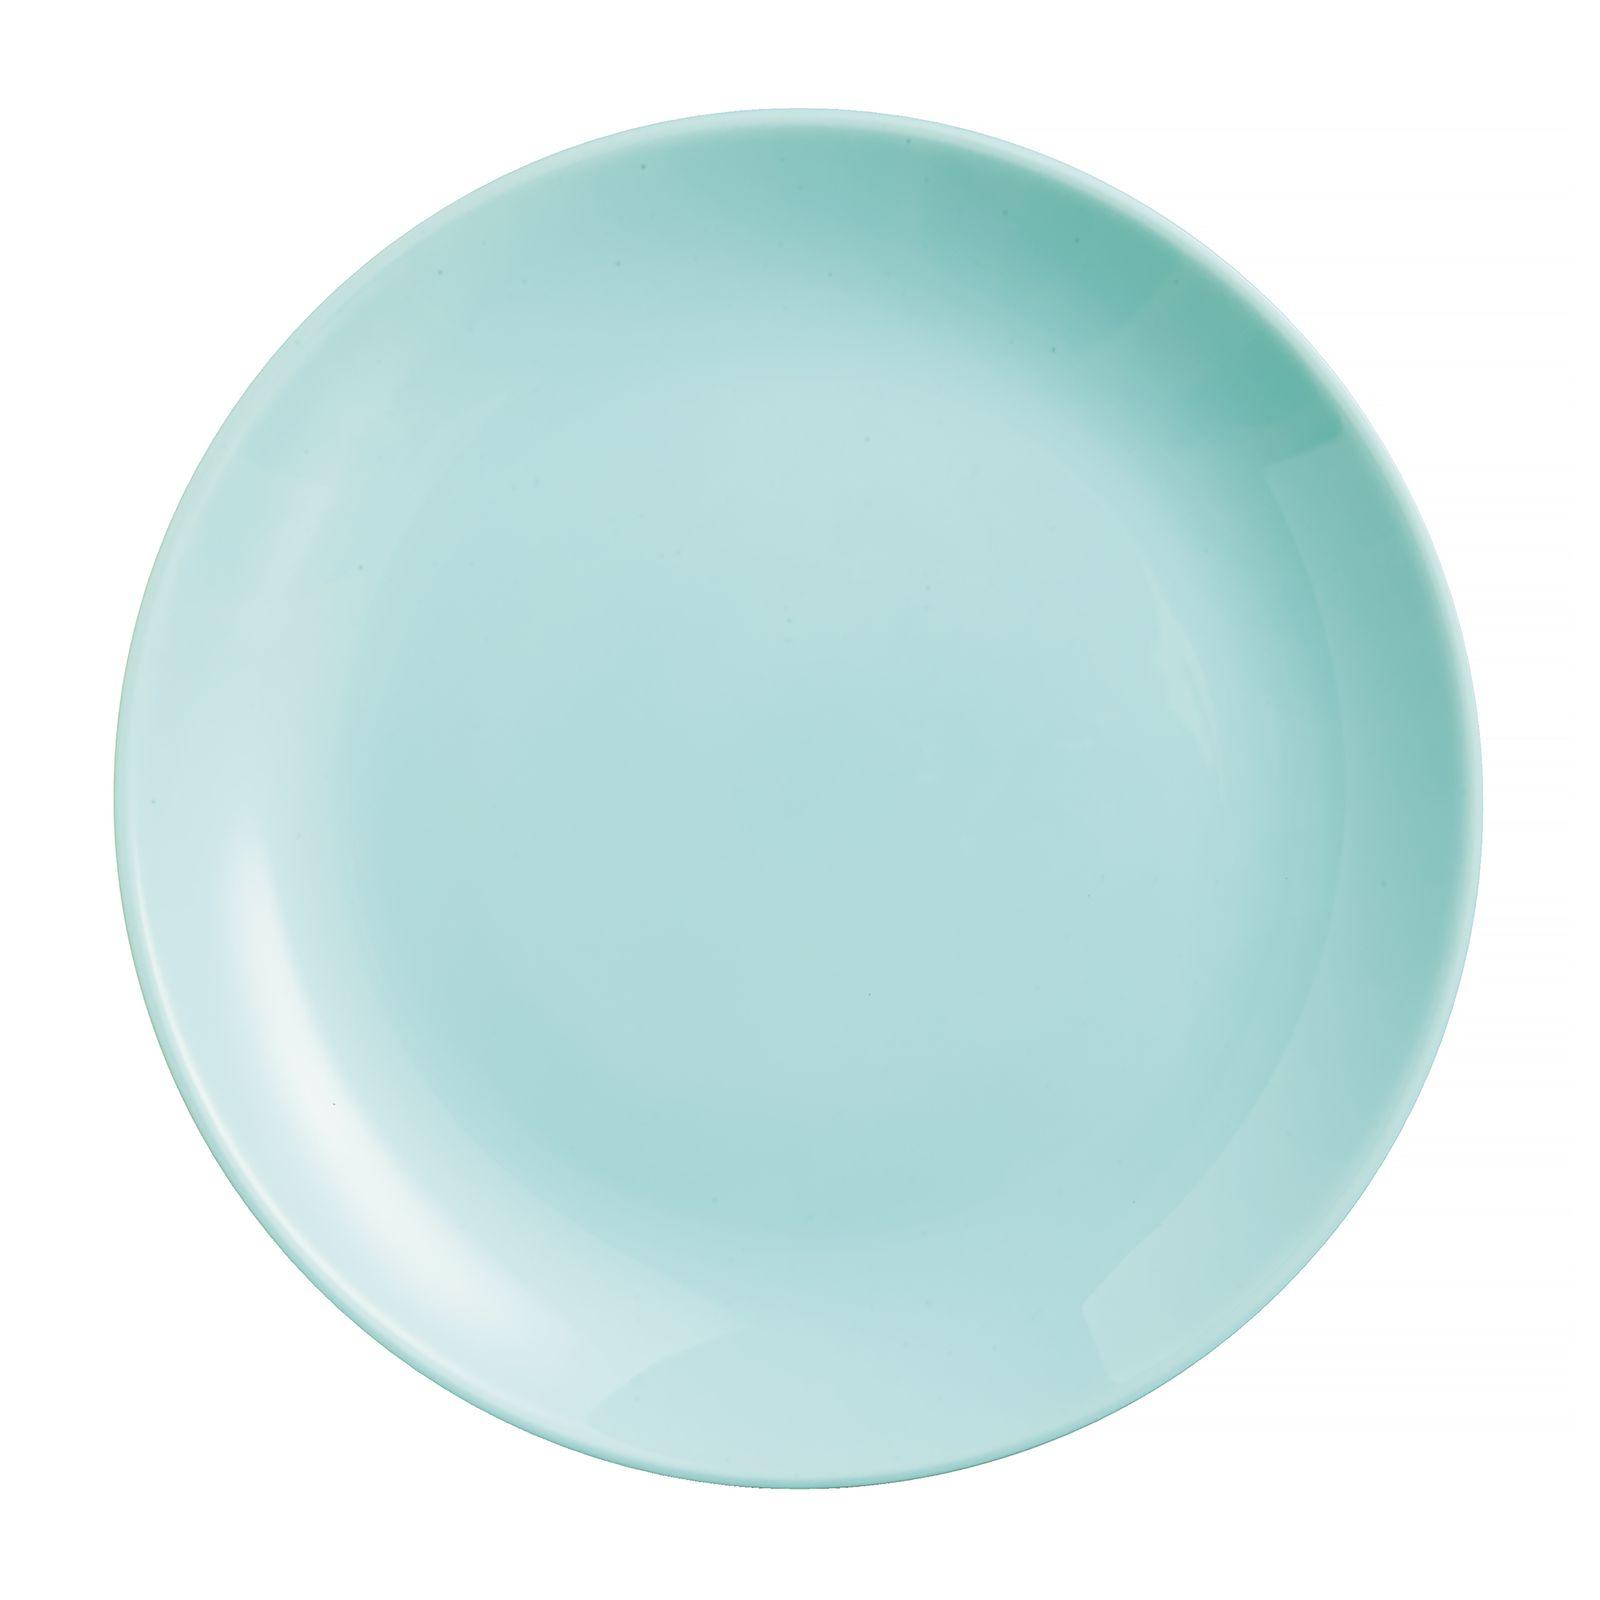 Talerz obiadowy Diwali Light Turquoise 25 cm LUMINARC